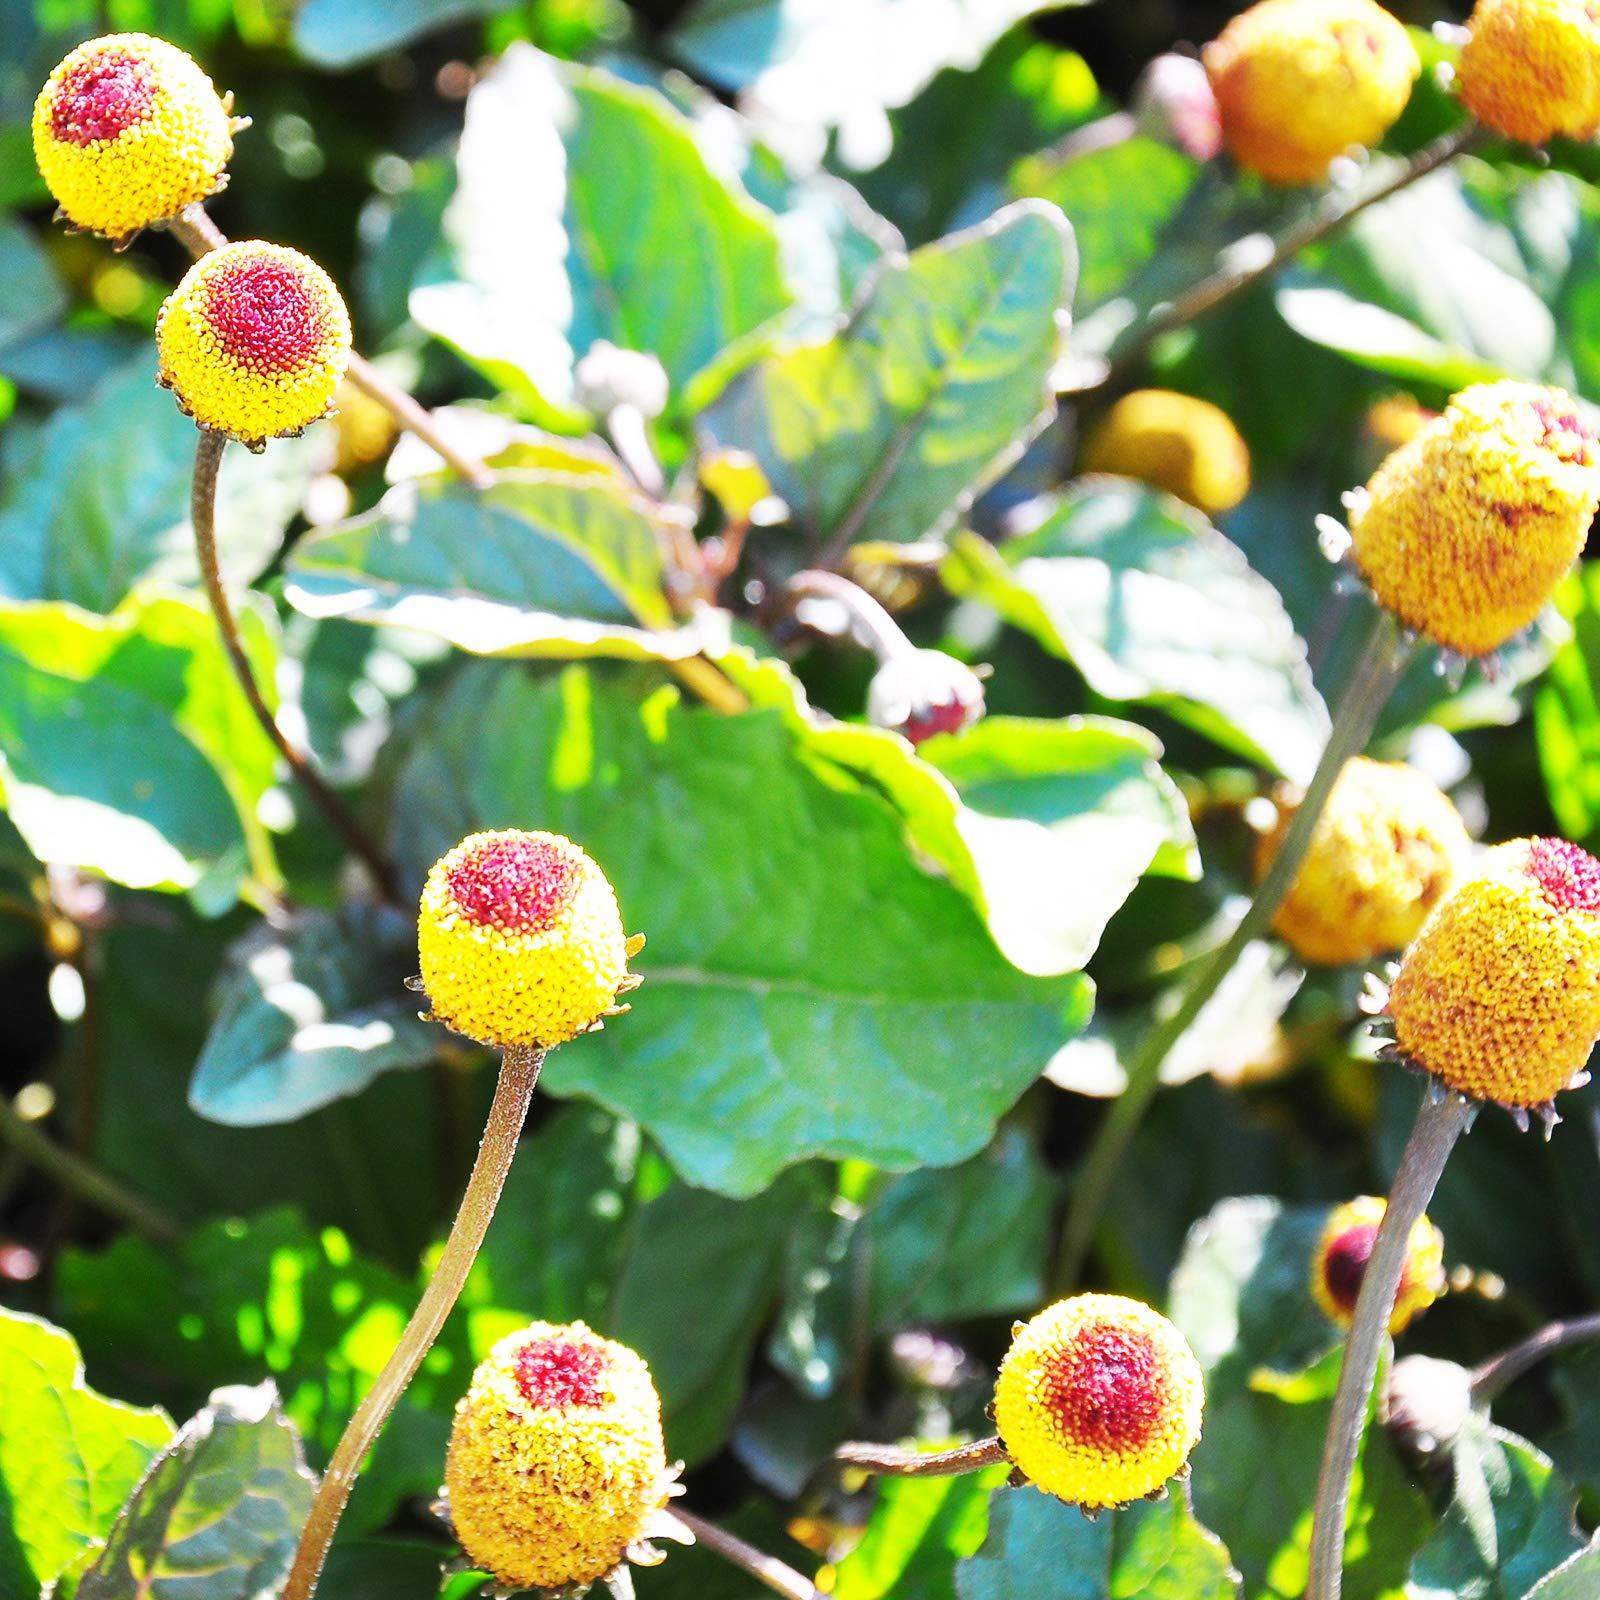 Paracress Seeds - 1 Lb - Non-GMO Medicinal Herb Garden & Microgreens Seeds - AKA: Toothache Plant, Electric Daisy, Eyeball Plant, Peek-A-Boo, Electric Buttons